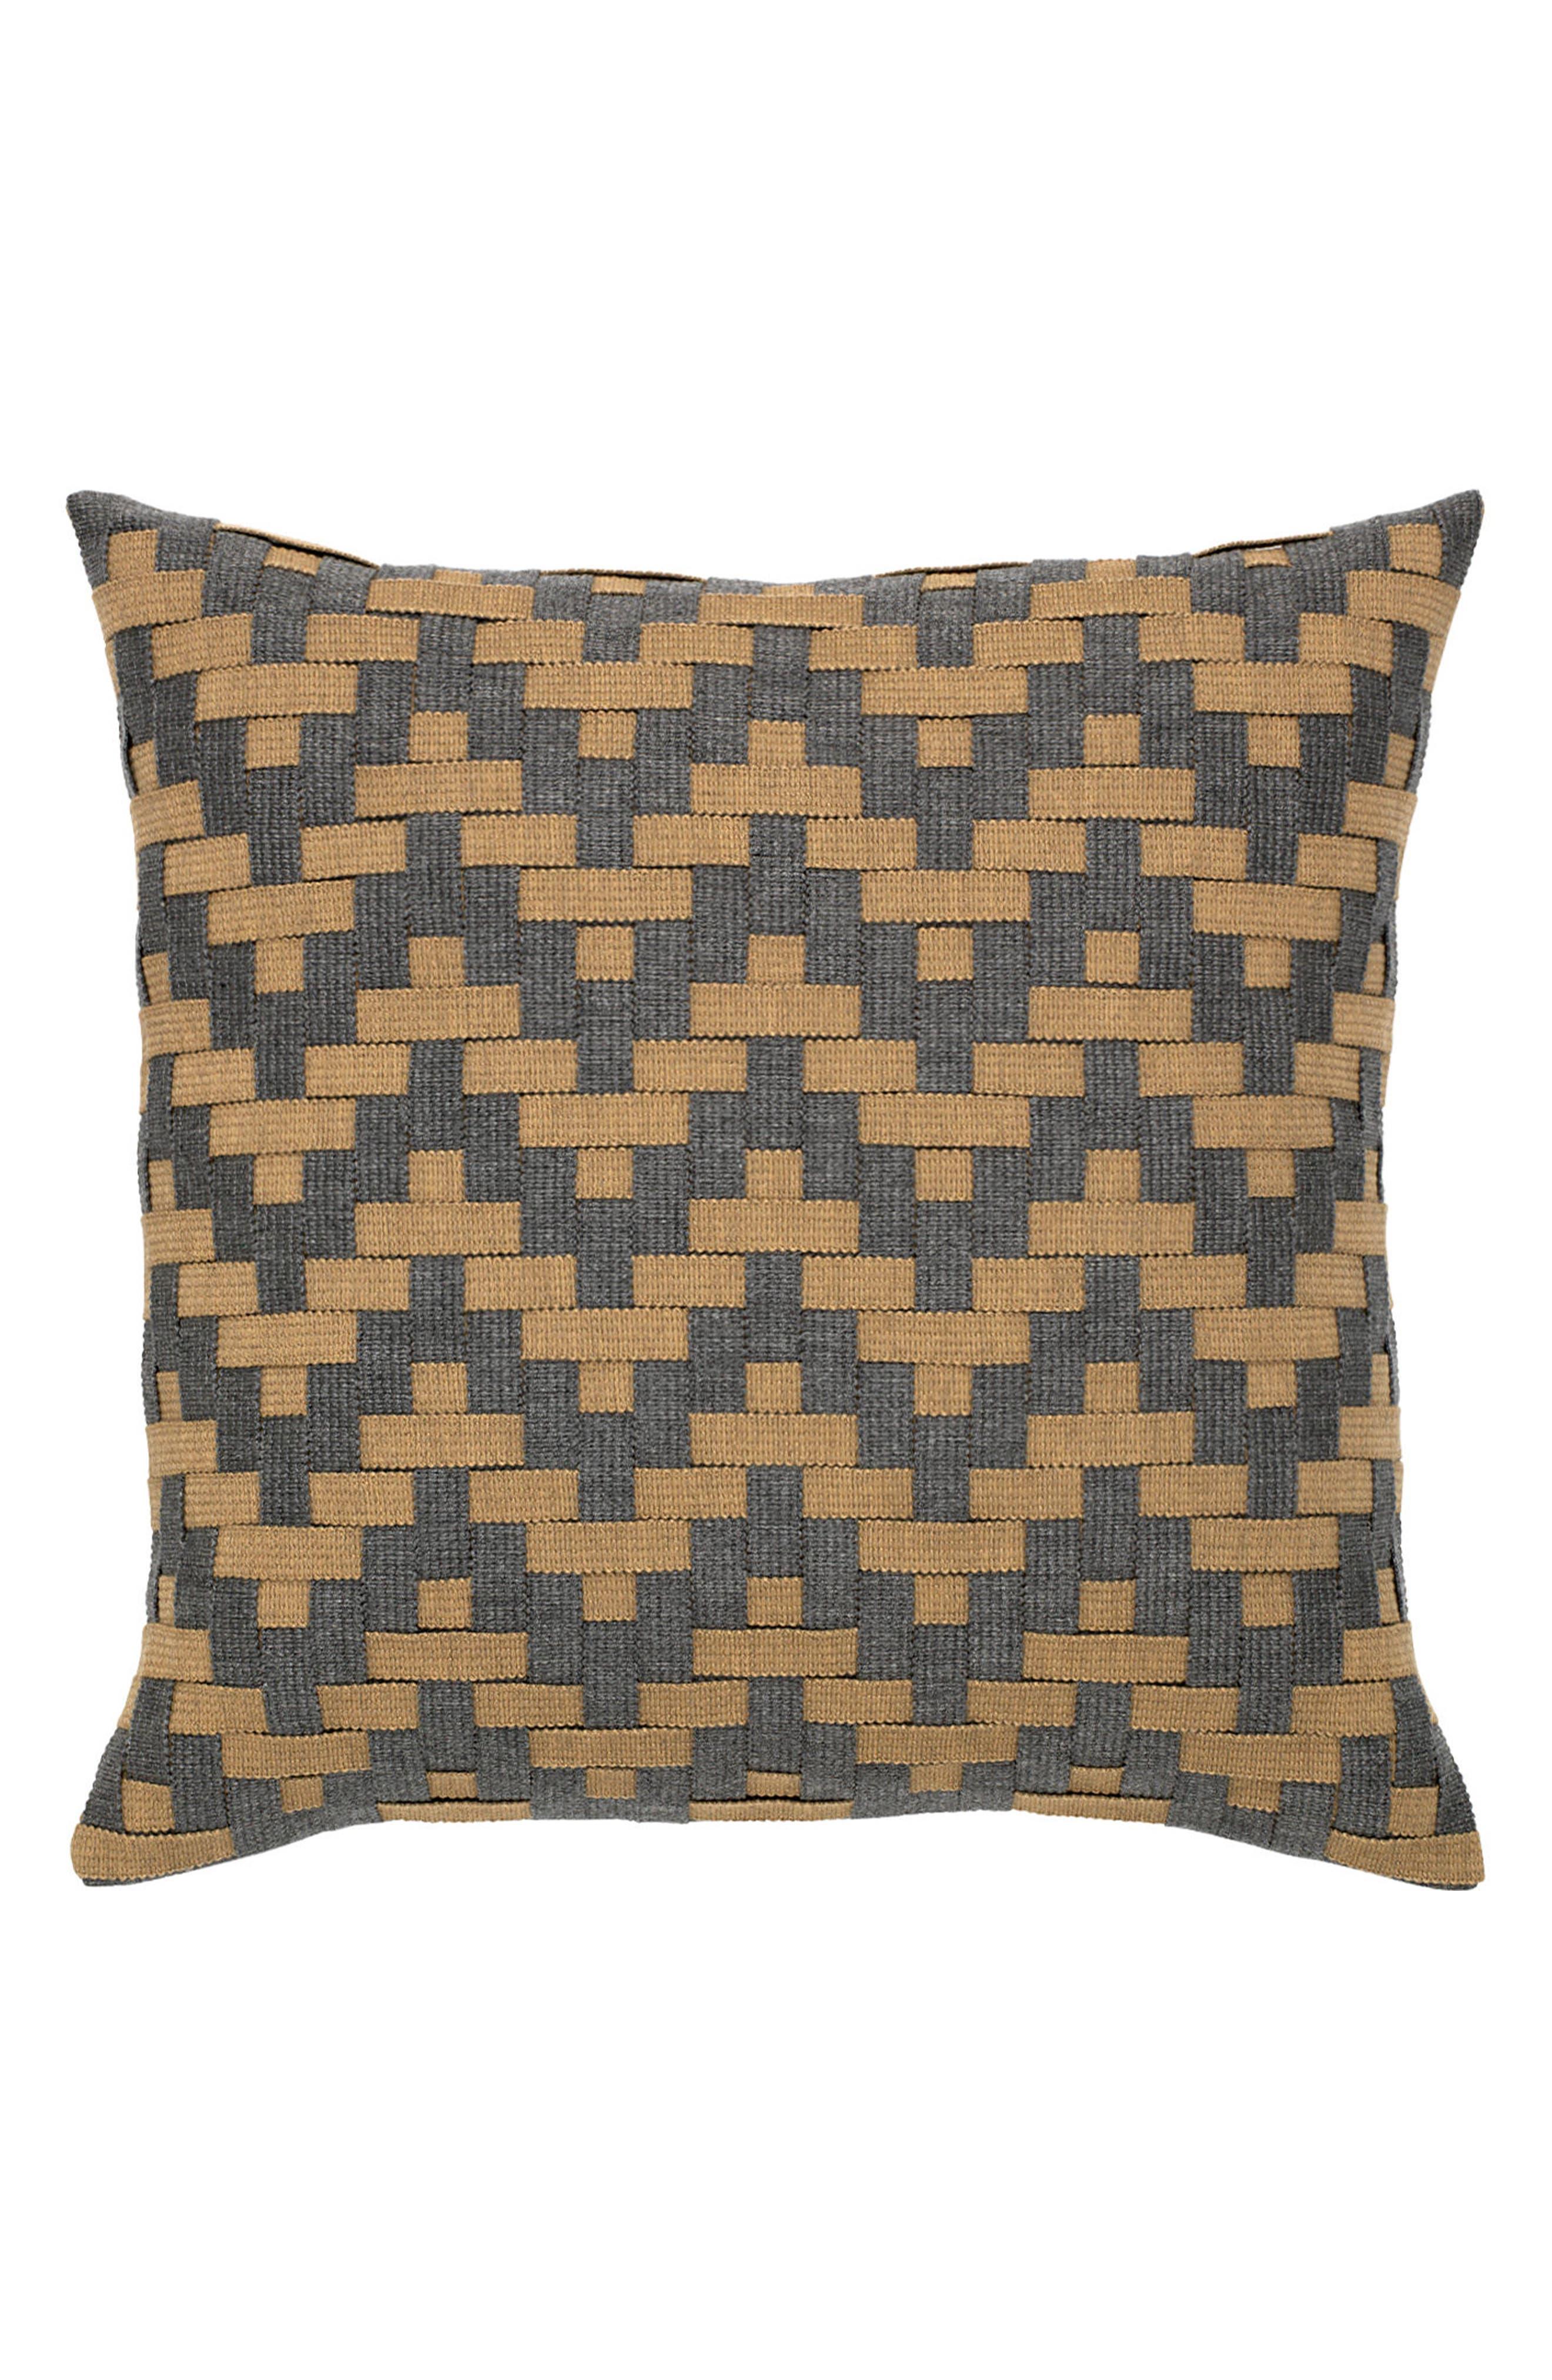 Main Image - Elaine Smith Smoke Basket Weave Indoor/Outdoor Accent Pillow